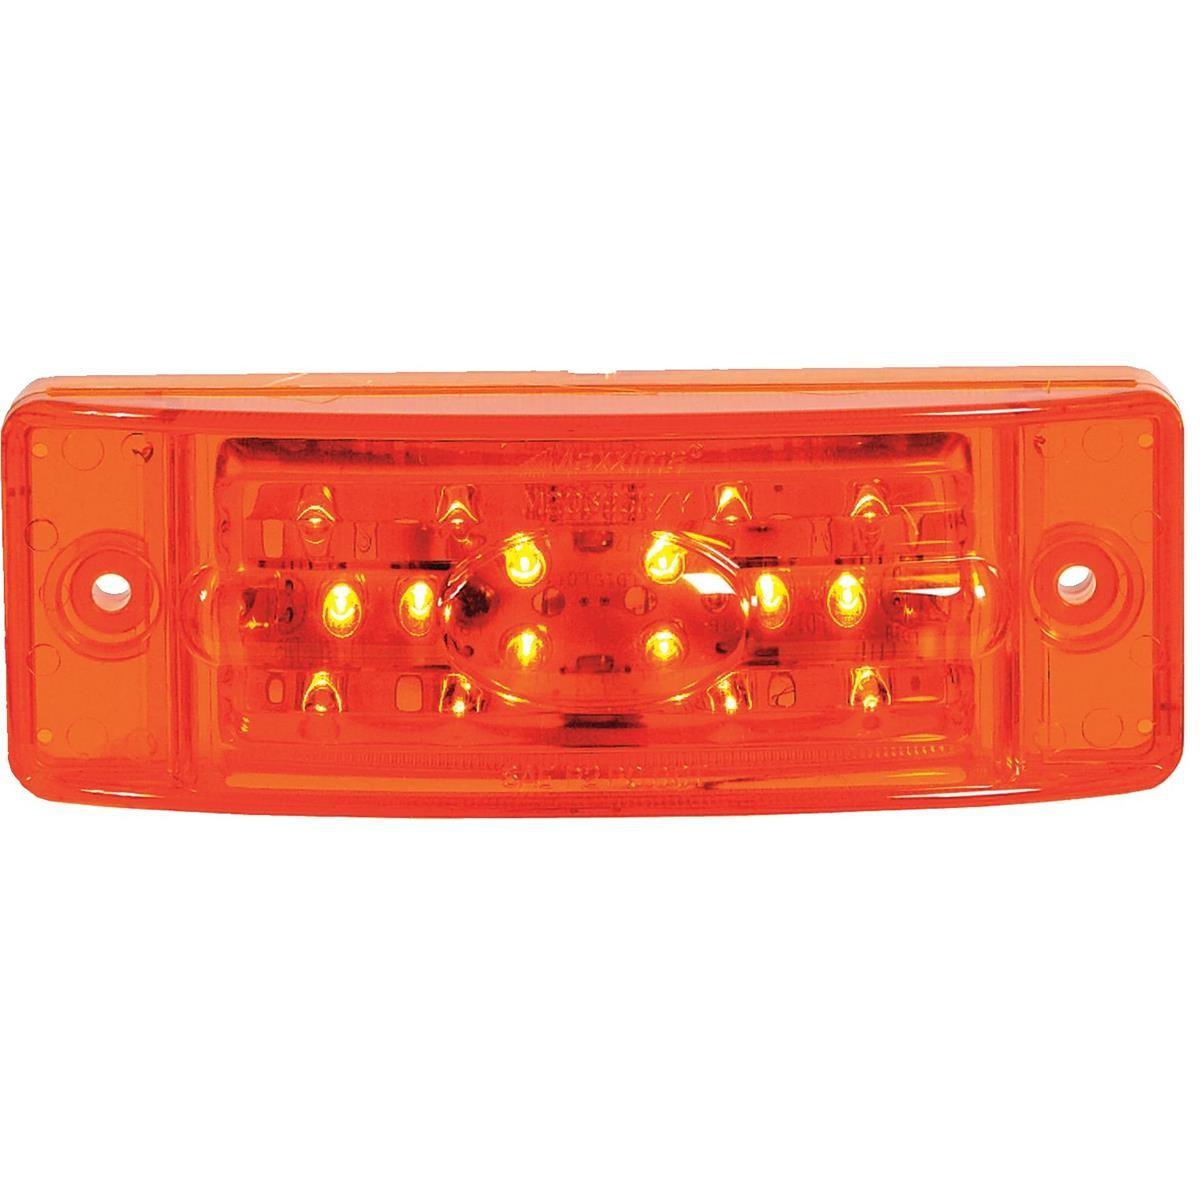 "MAXXIMA 18 LED bination Clearance Marker Light Amber 5 15 16""L x 2 1 8""H x 1 5 8""D"